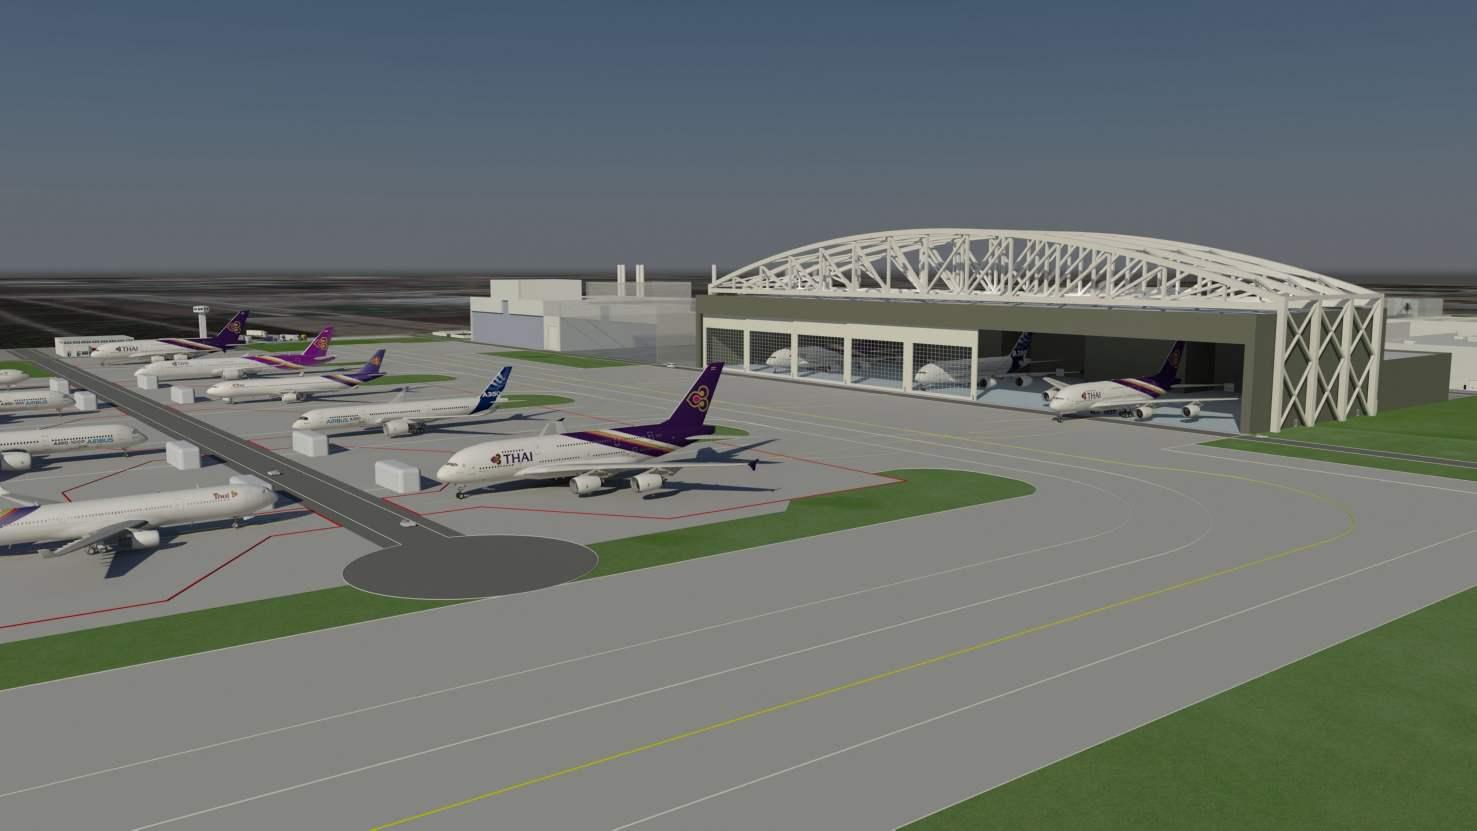 Airbus, THAI confirm MRO joint venture